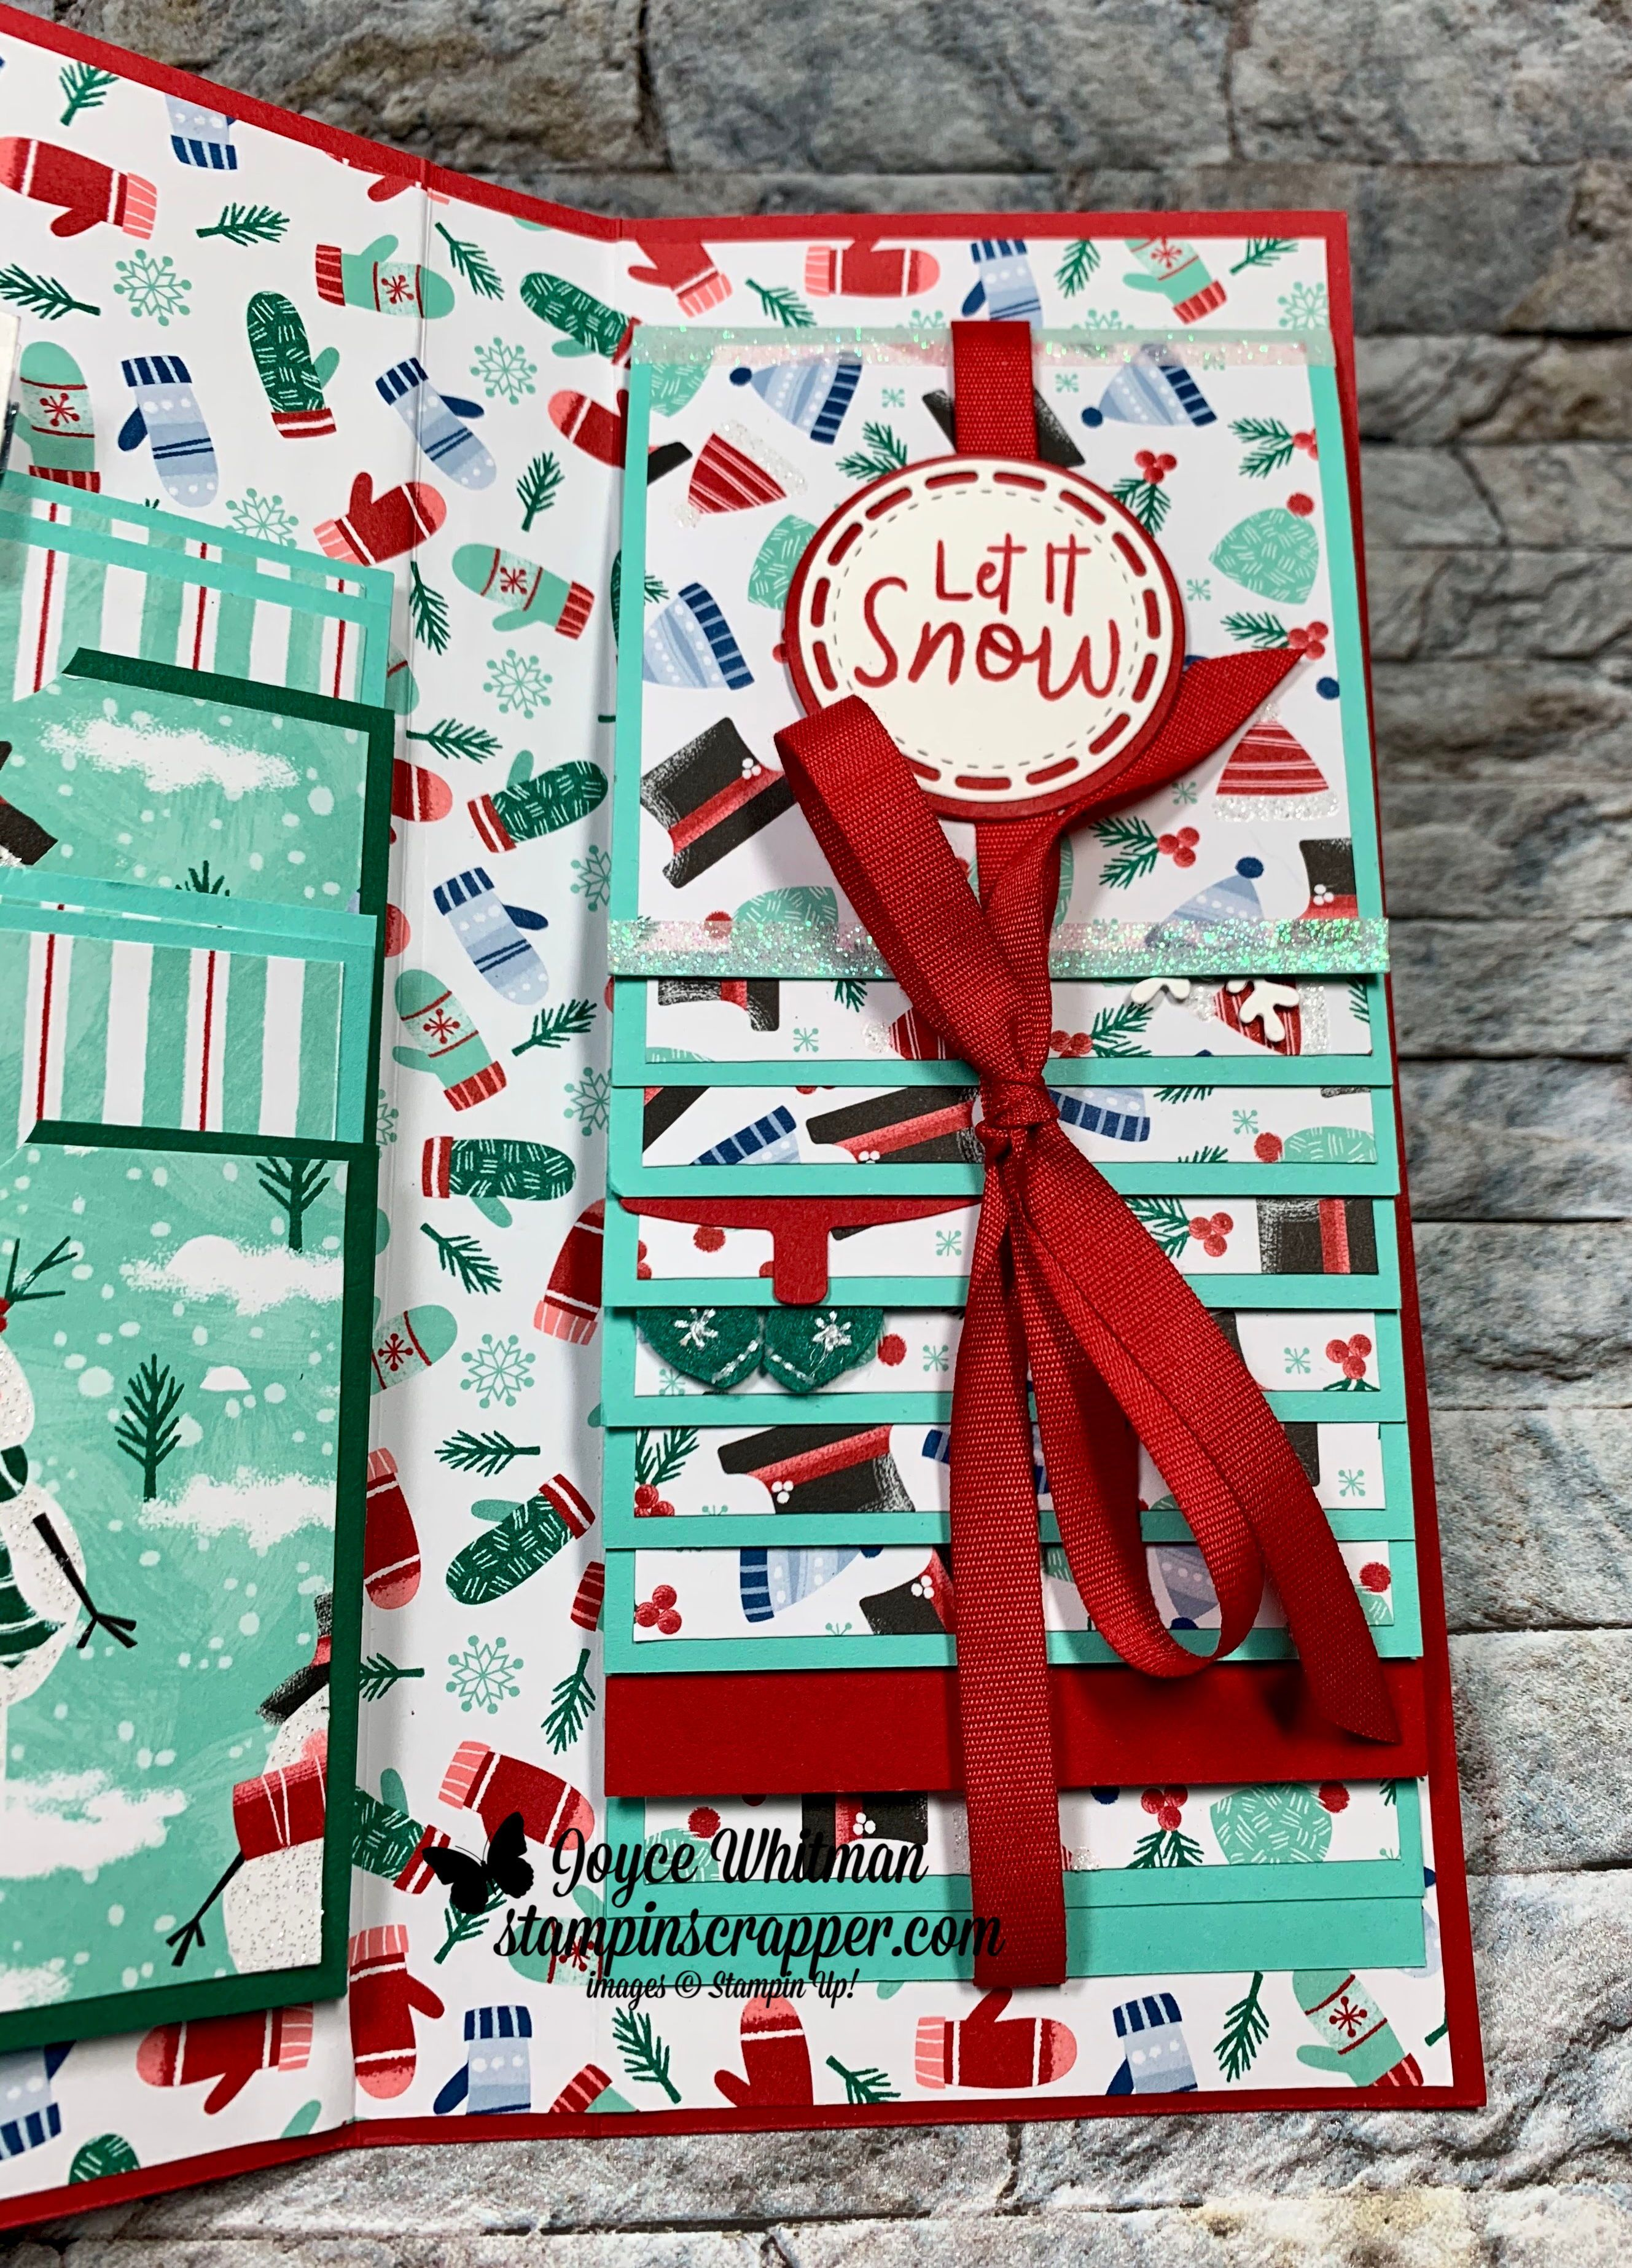 Merry Christmas Monday 2019 Week 8 Christmas Album. I